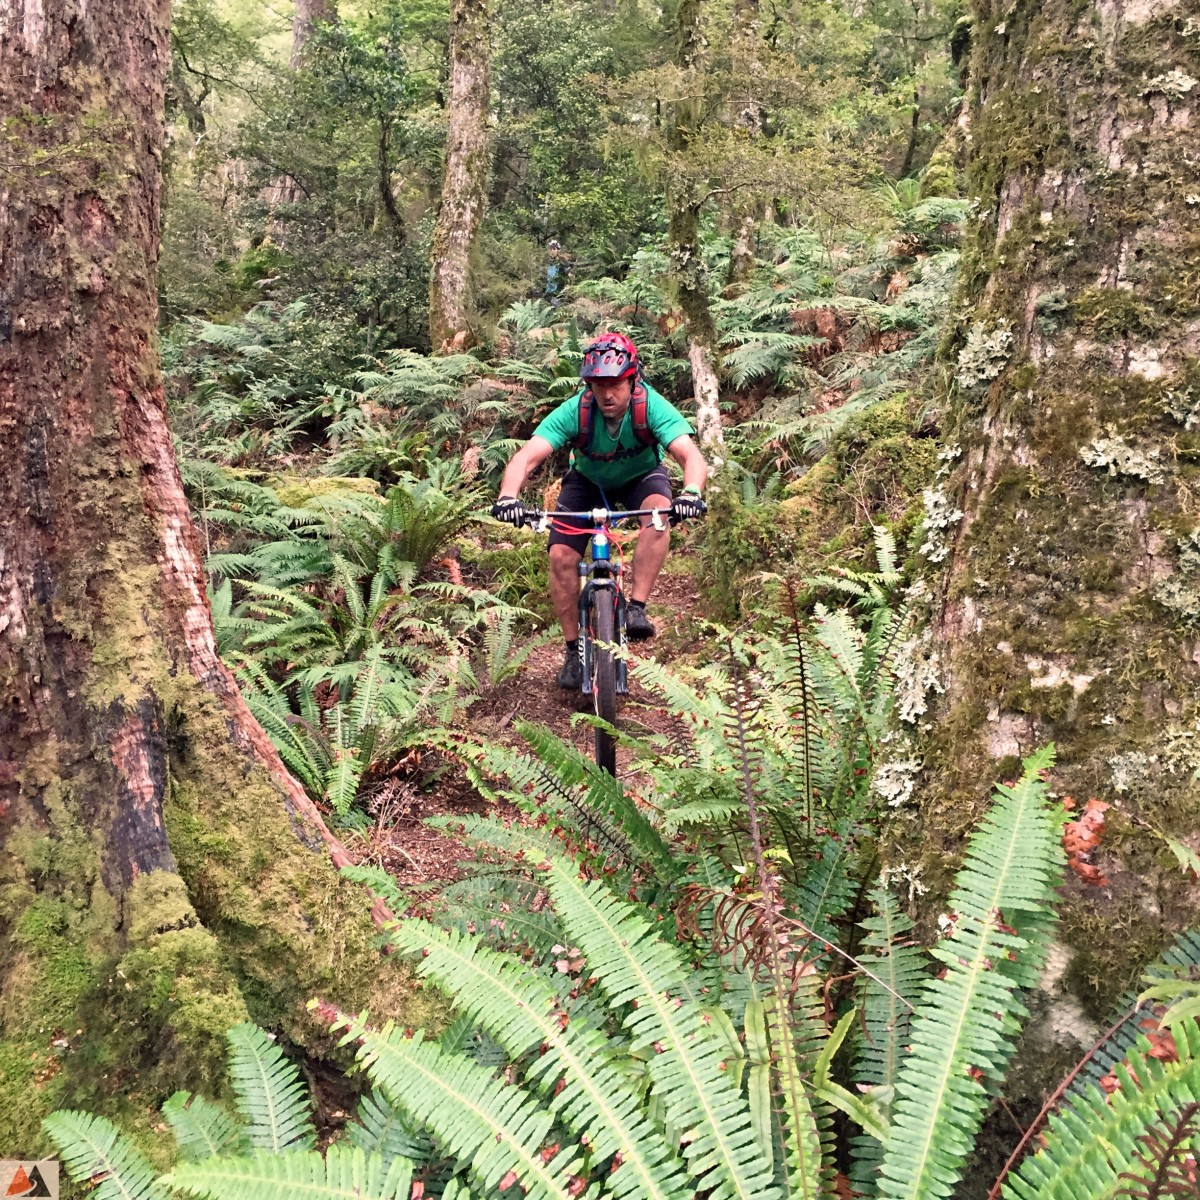 Aaron getting native in the Te Iringa backcountry